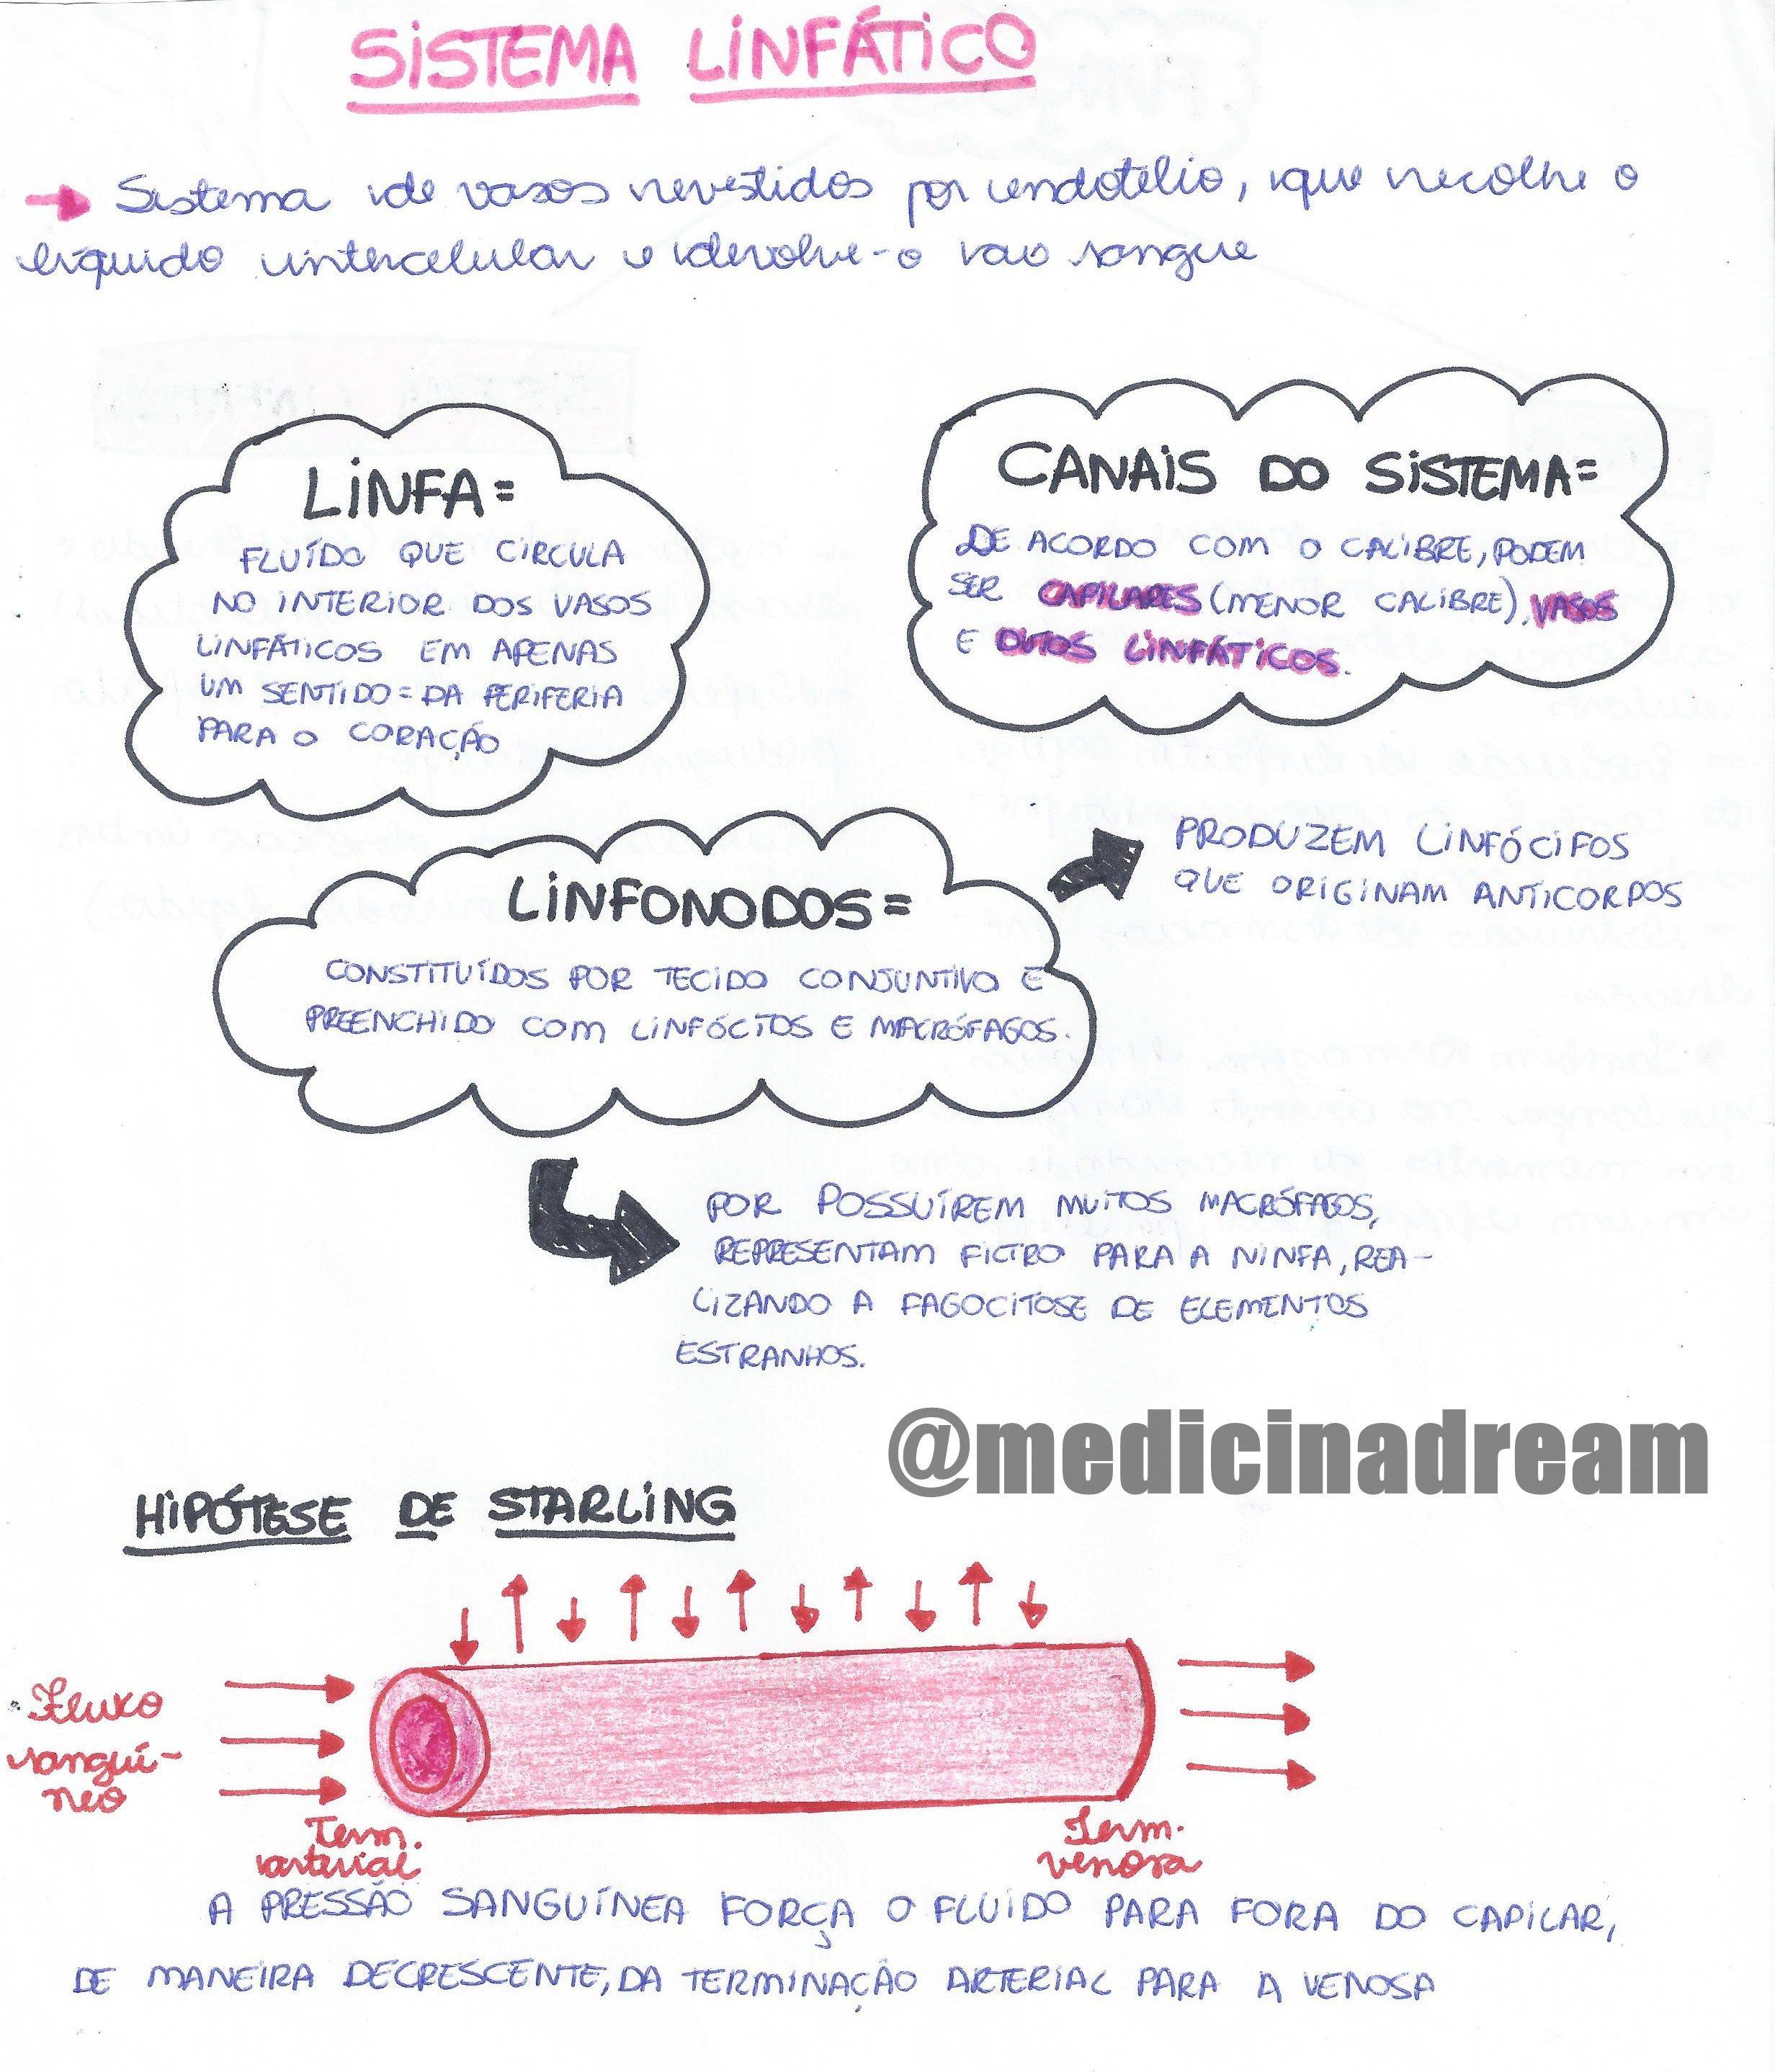 Sistema Linfático | medicina | Pinterest | Sistema linfático ...